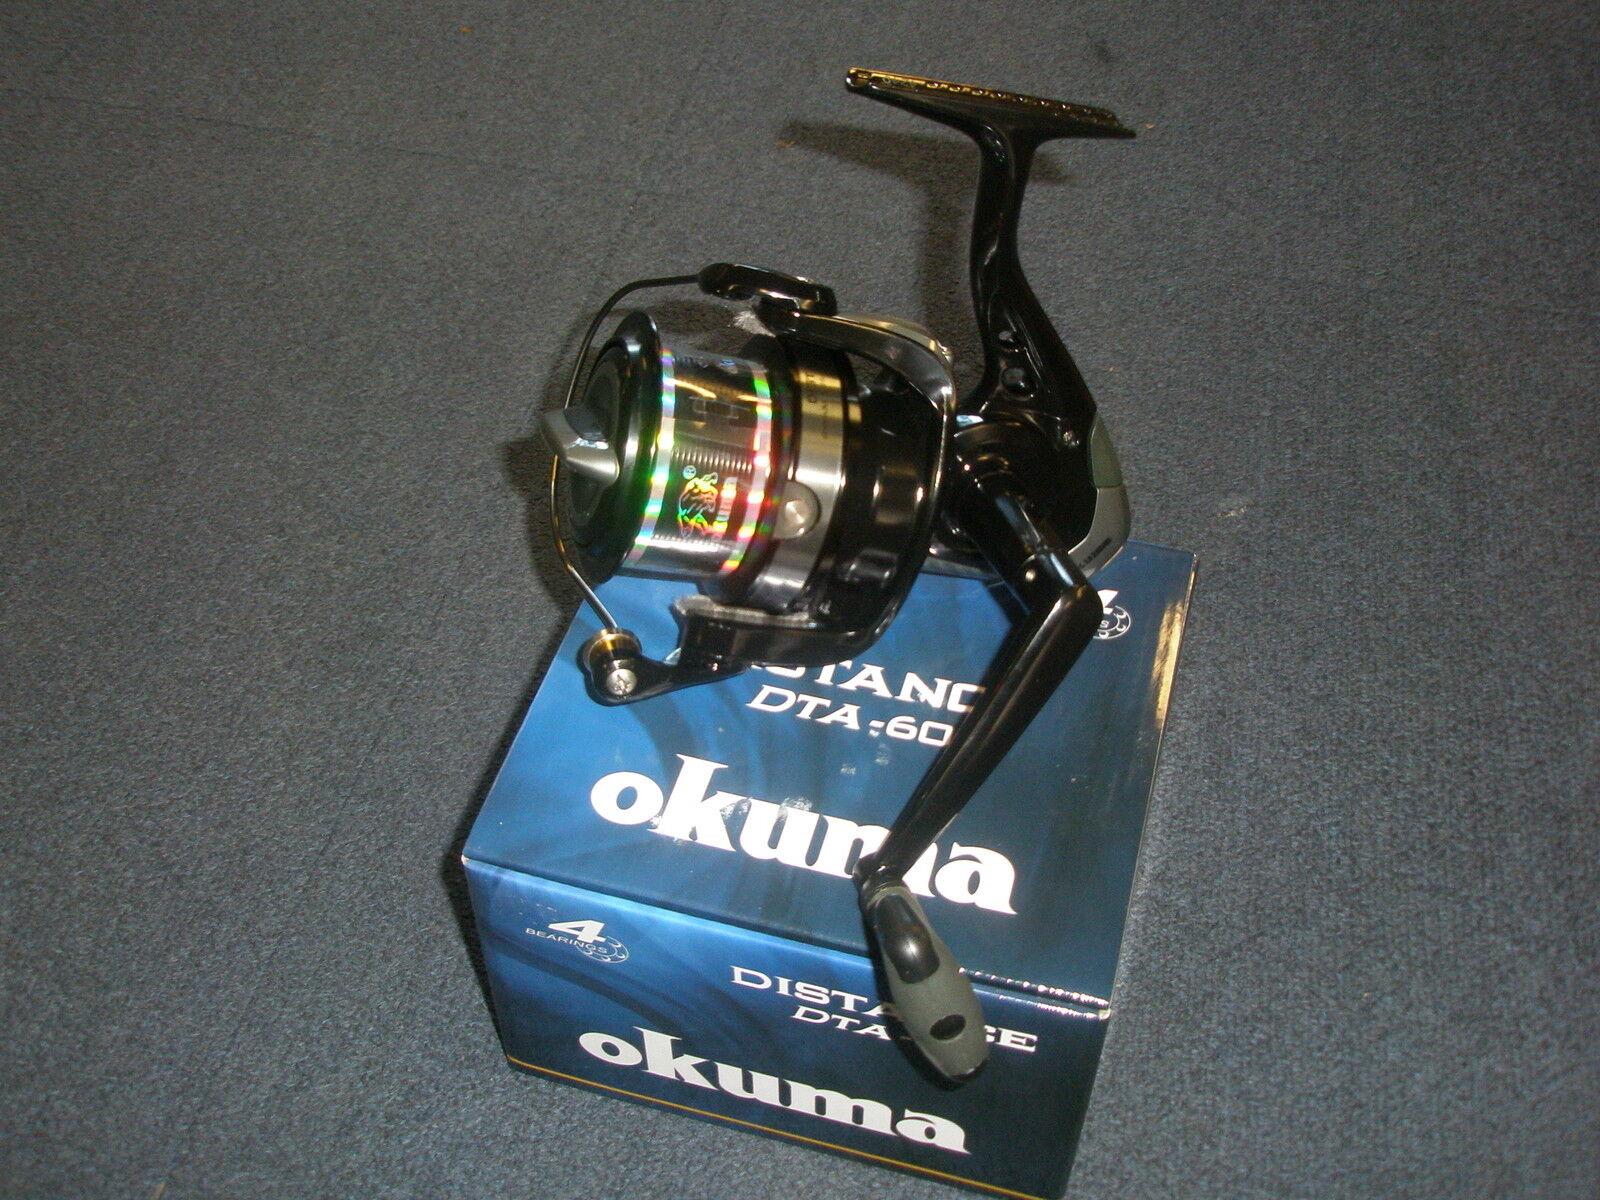 Okuma Entfernung Karpfenangeln Dta 60 Big Pit Rolle Karpfenangeln Entfernung Ausrüstung 361624